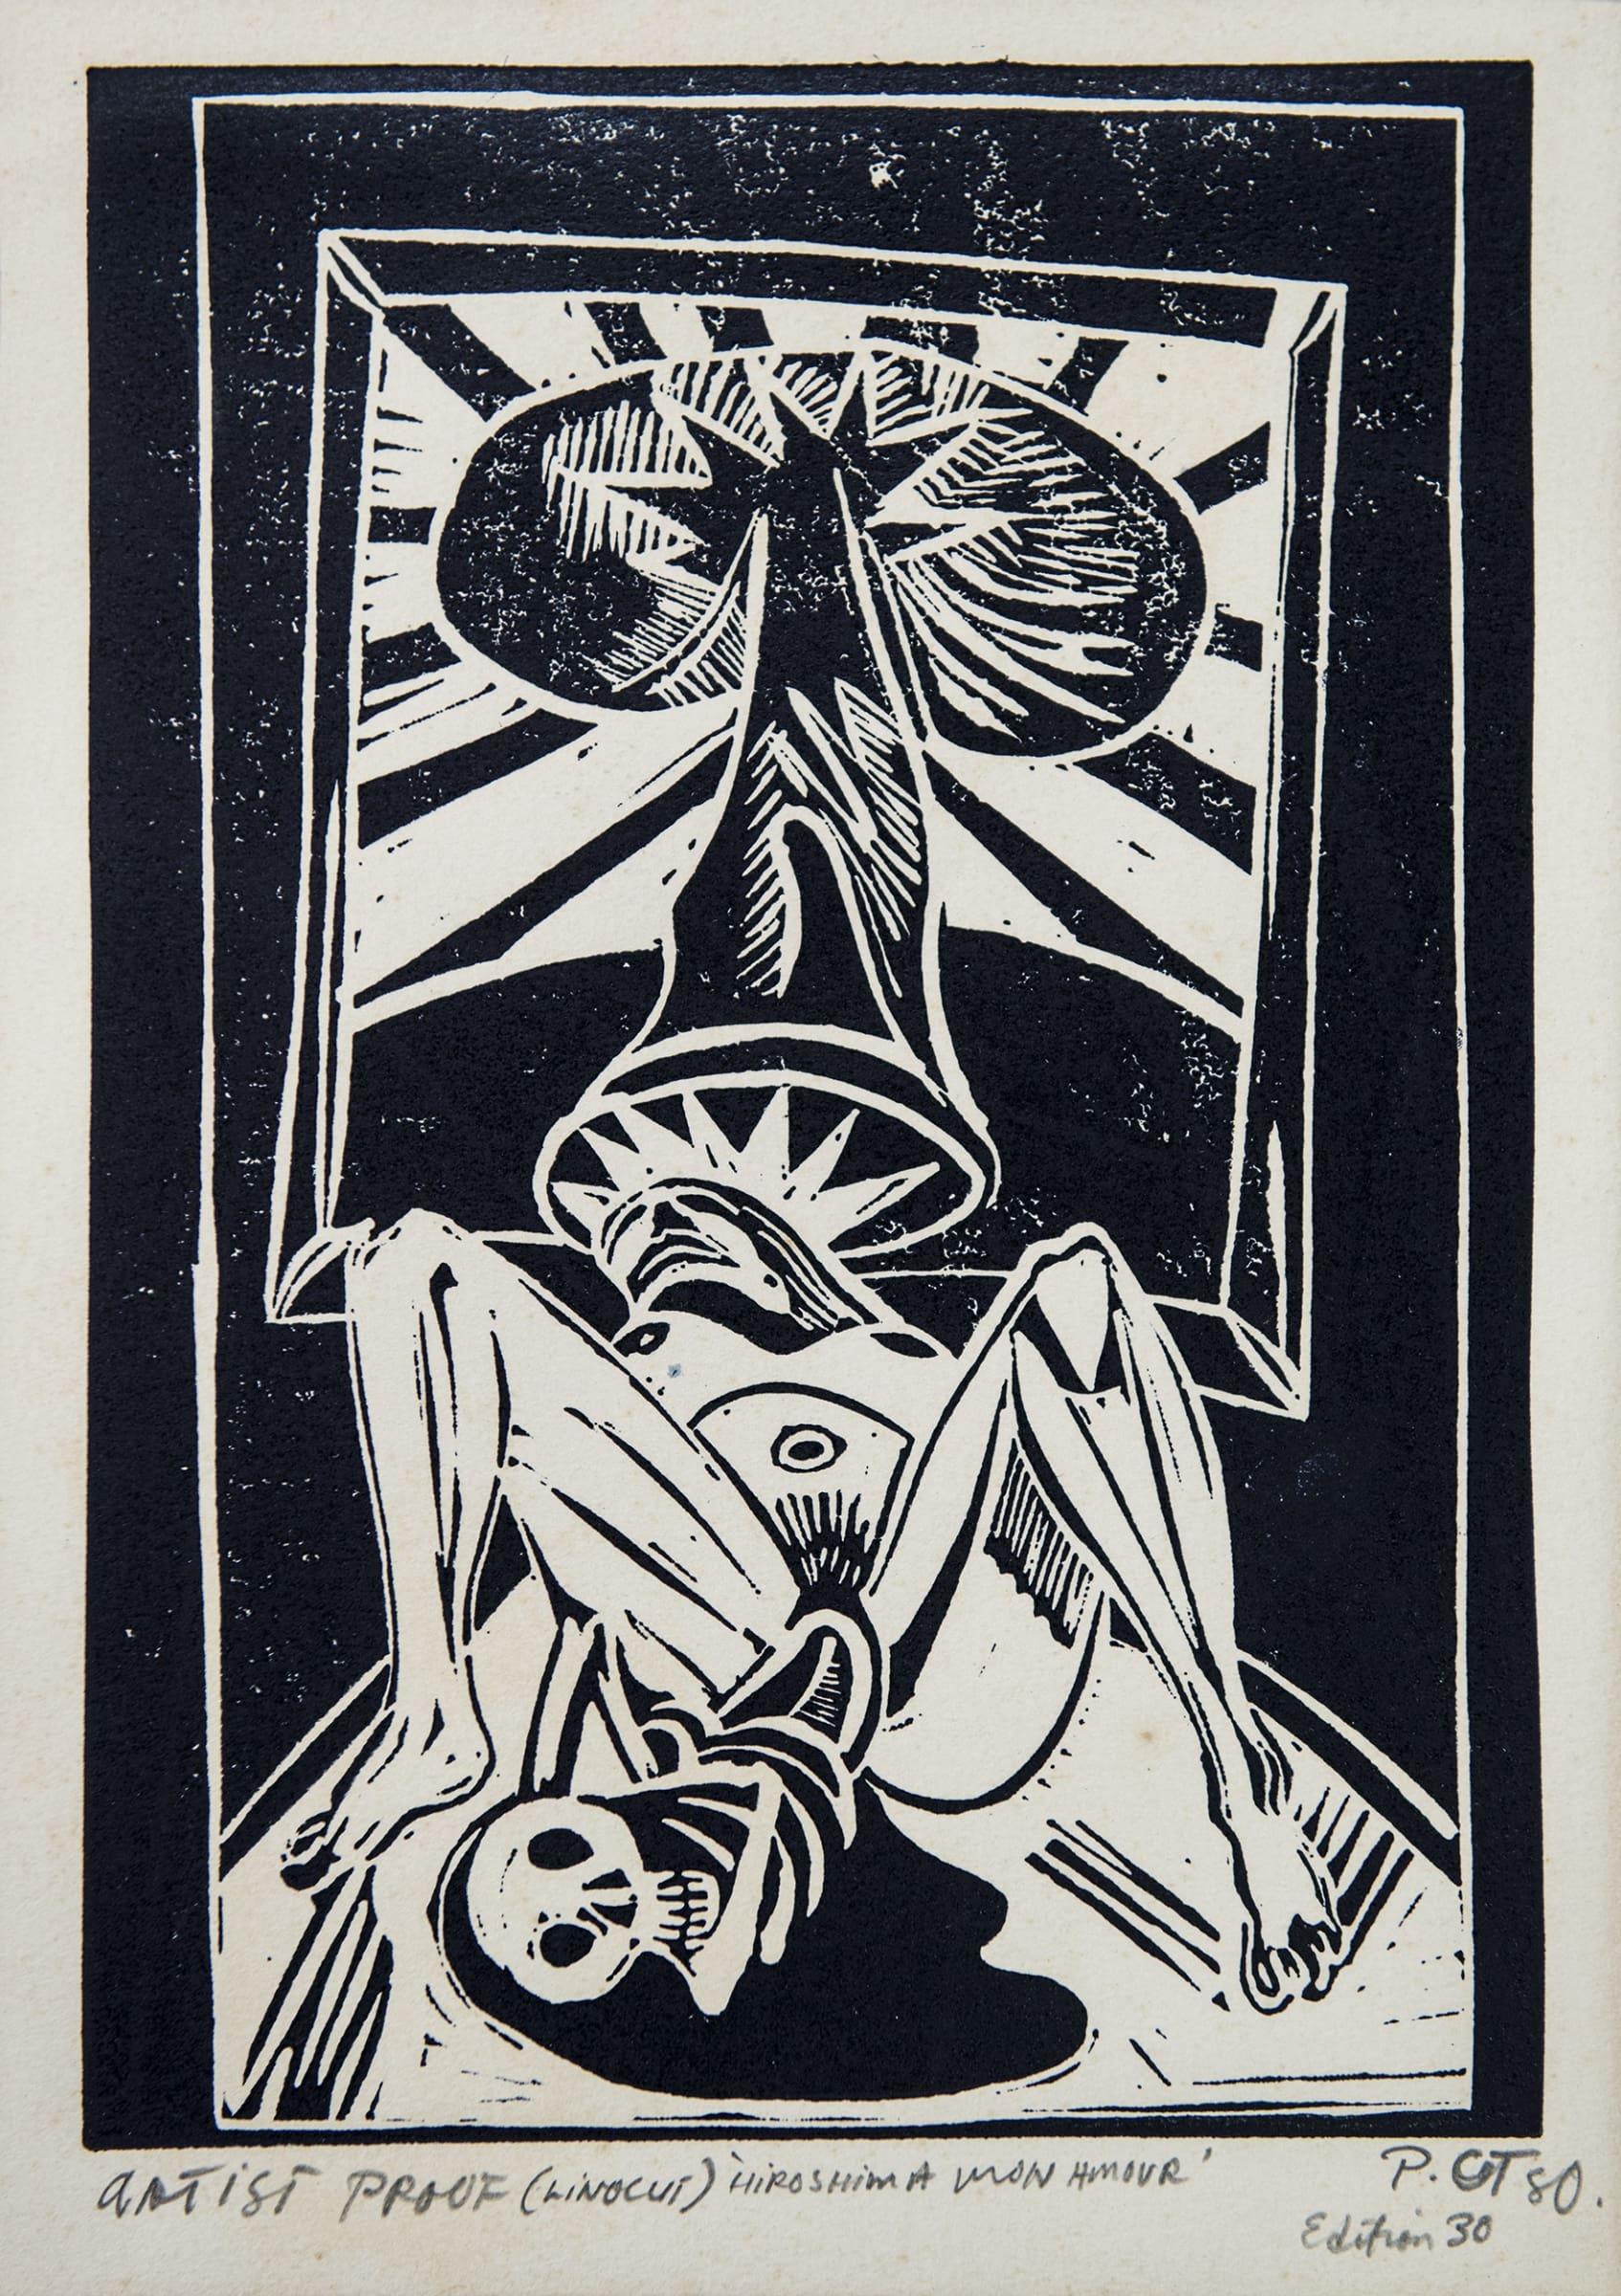 <span class=&#34;link fancybox-details-link&#34;><a href=&#34;/artists/74-philip-clairmont/works/6882-philip-clairmont-hiroshima-a-p-1980/&#34;>View Detail Page</a></span><div class=&#34;artist&#34;><strong>Philip CLAIRMONT</strong></div> <div class=&#34;title&#34;><em>Hiroshima, A/P</em>, 1980</div> <div class=&#34;medium&#34;>Linocut print</div> <div class=&#34;dimensions&#34;>17.7 x 13.2 in<br />45 x 33.5 cm</div>